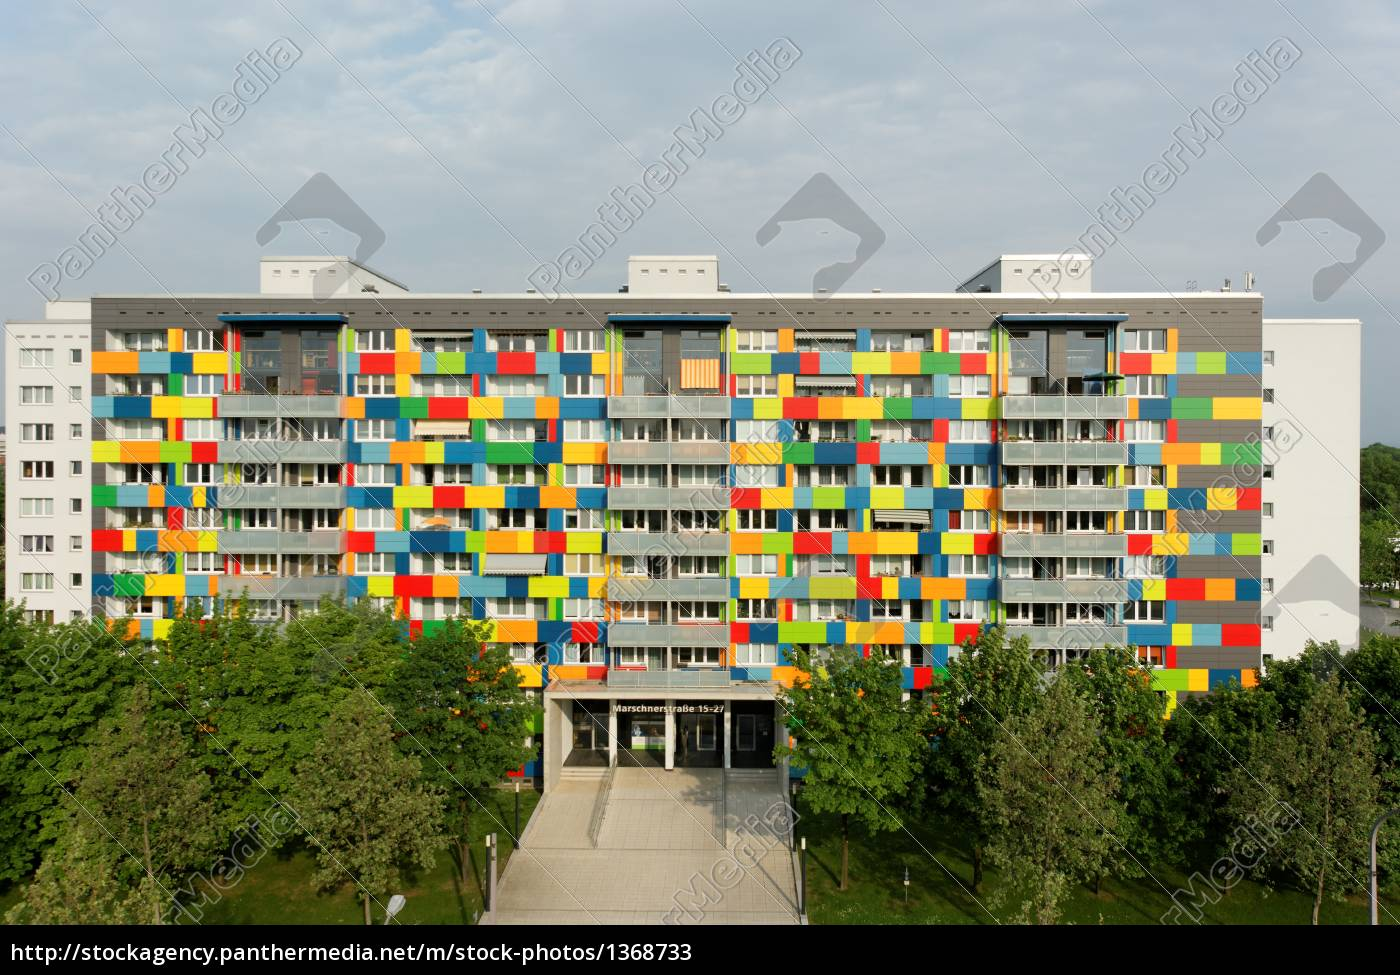 fassade wohnhaus gekonnt farbig frontal lizenzfreies bild 1368733 bildagentur panthermedia. Black Bedroom Furniture Sets. Home Design Ideas